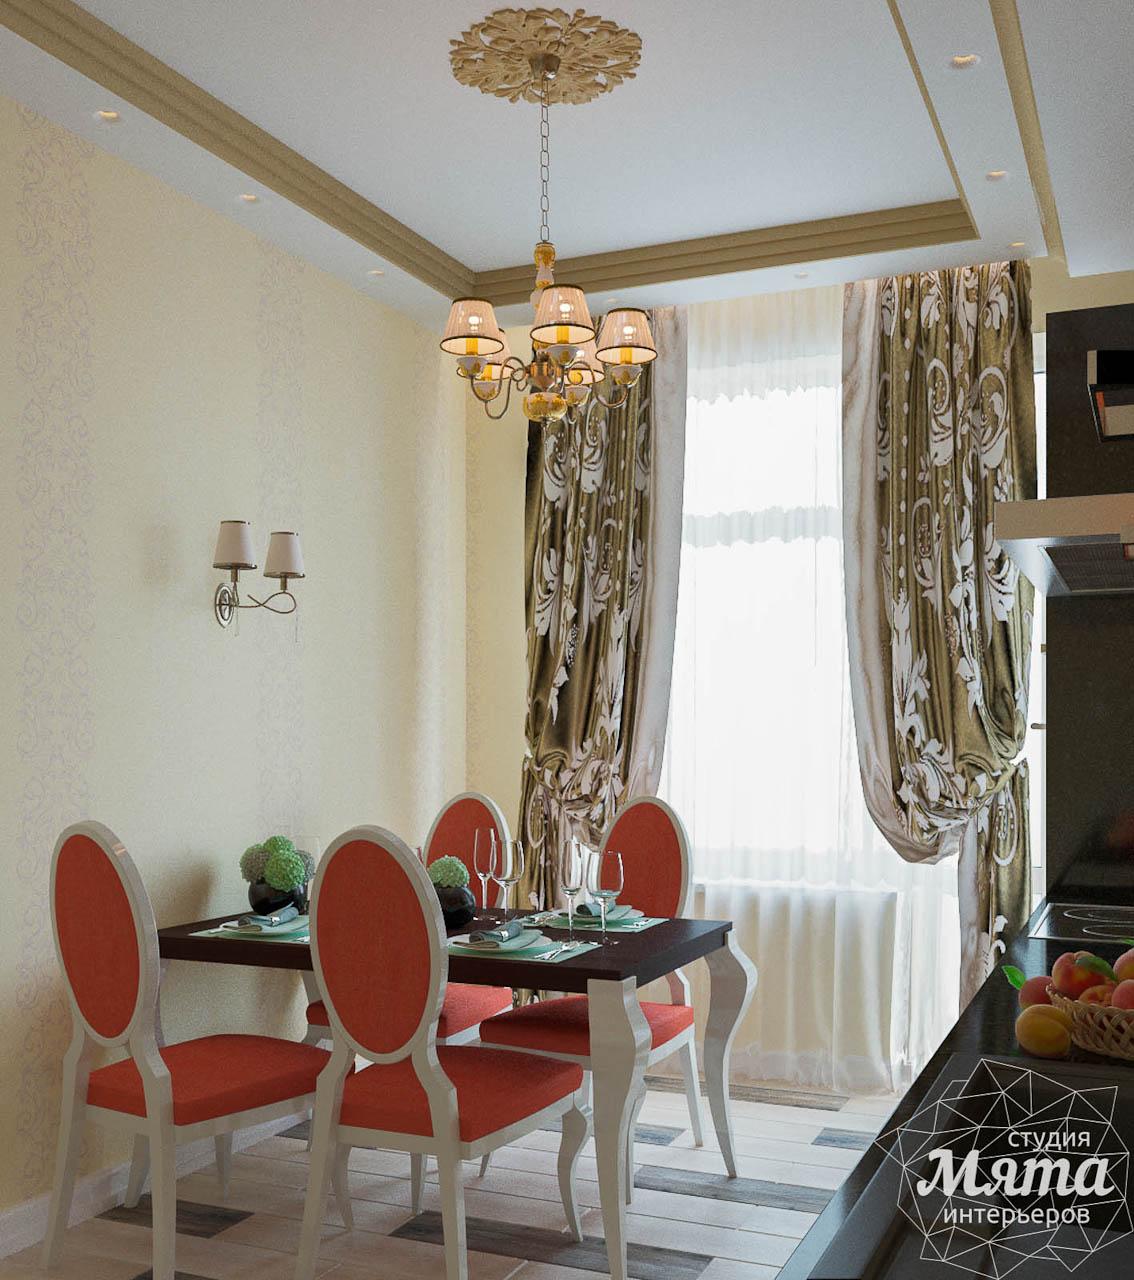 Дизайн интерьера и ремонт трехкомнатной квартиры в Карасьозерском 2 img1696701388